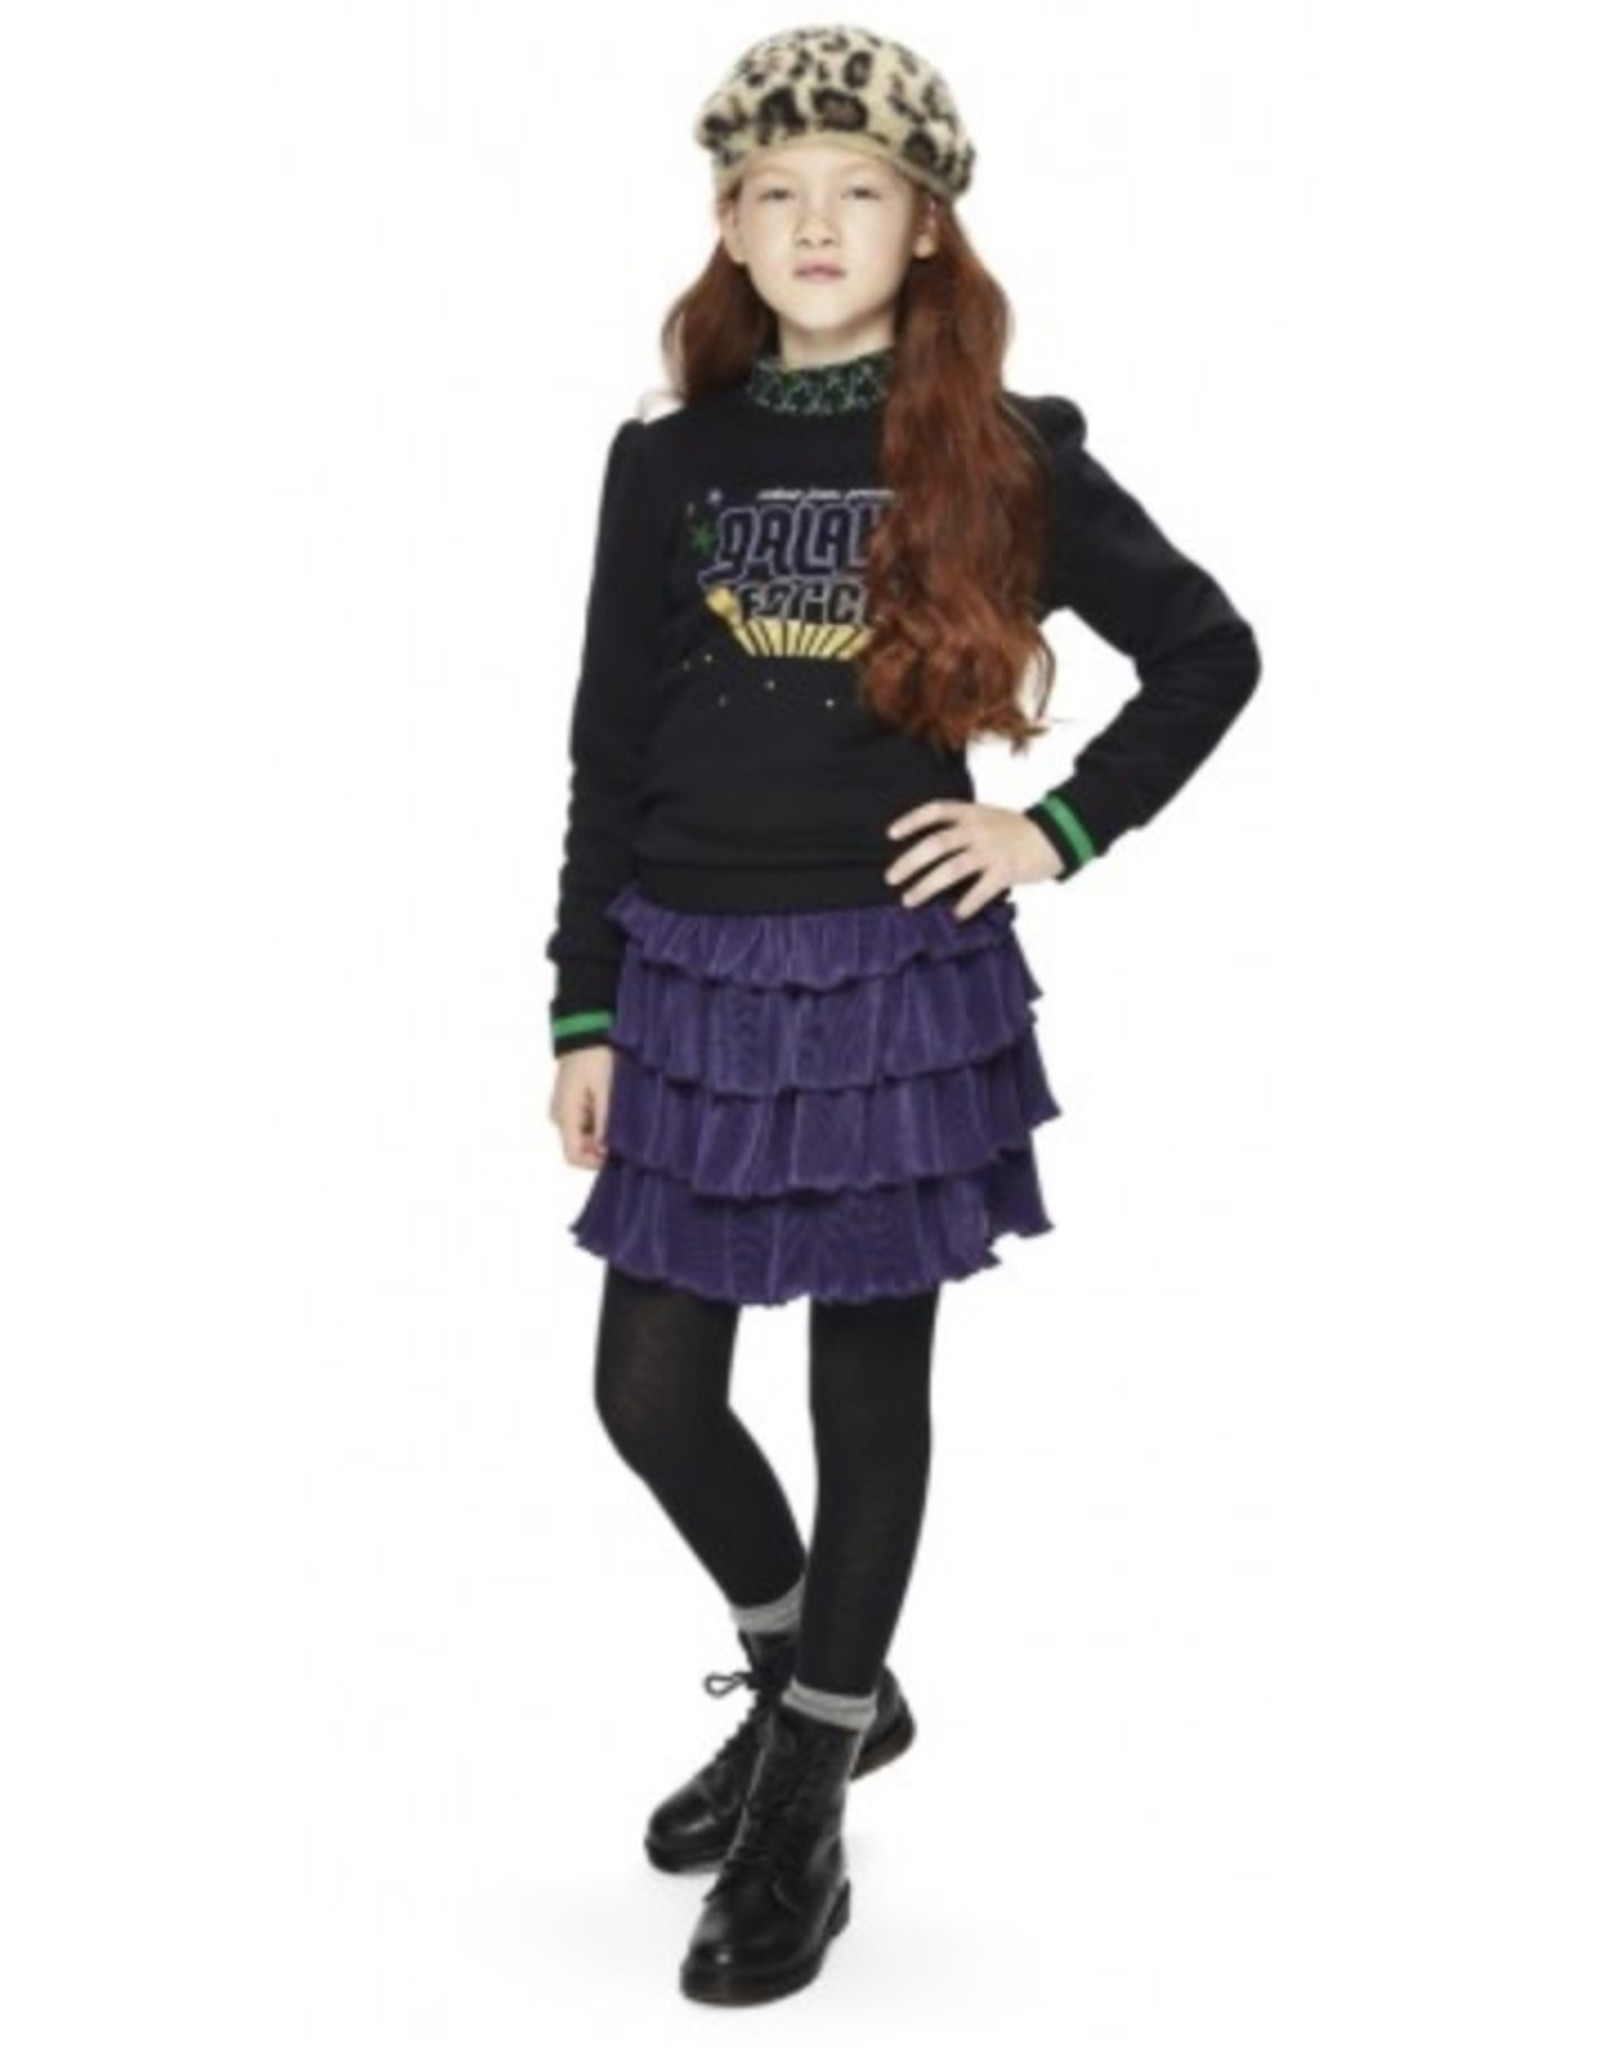 Retour Amber sweater